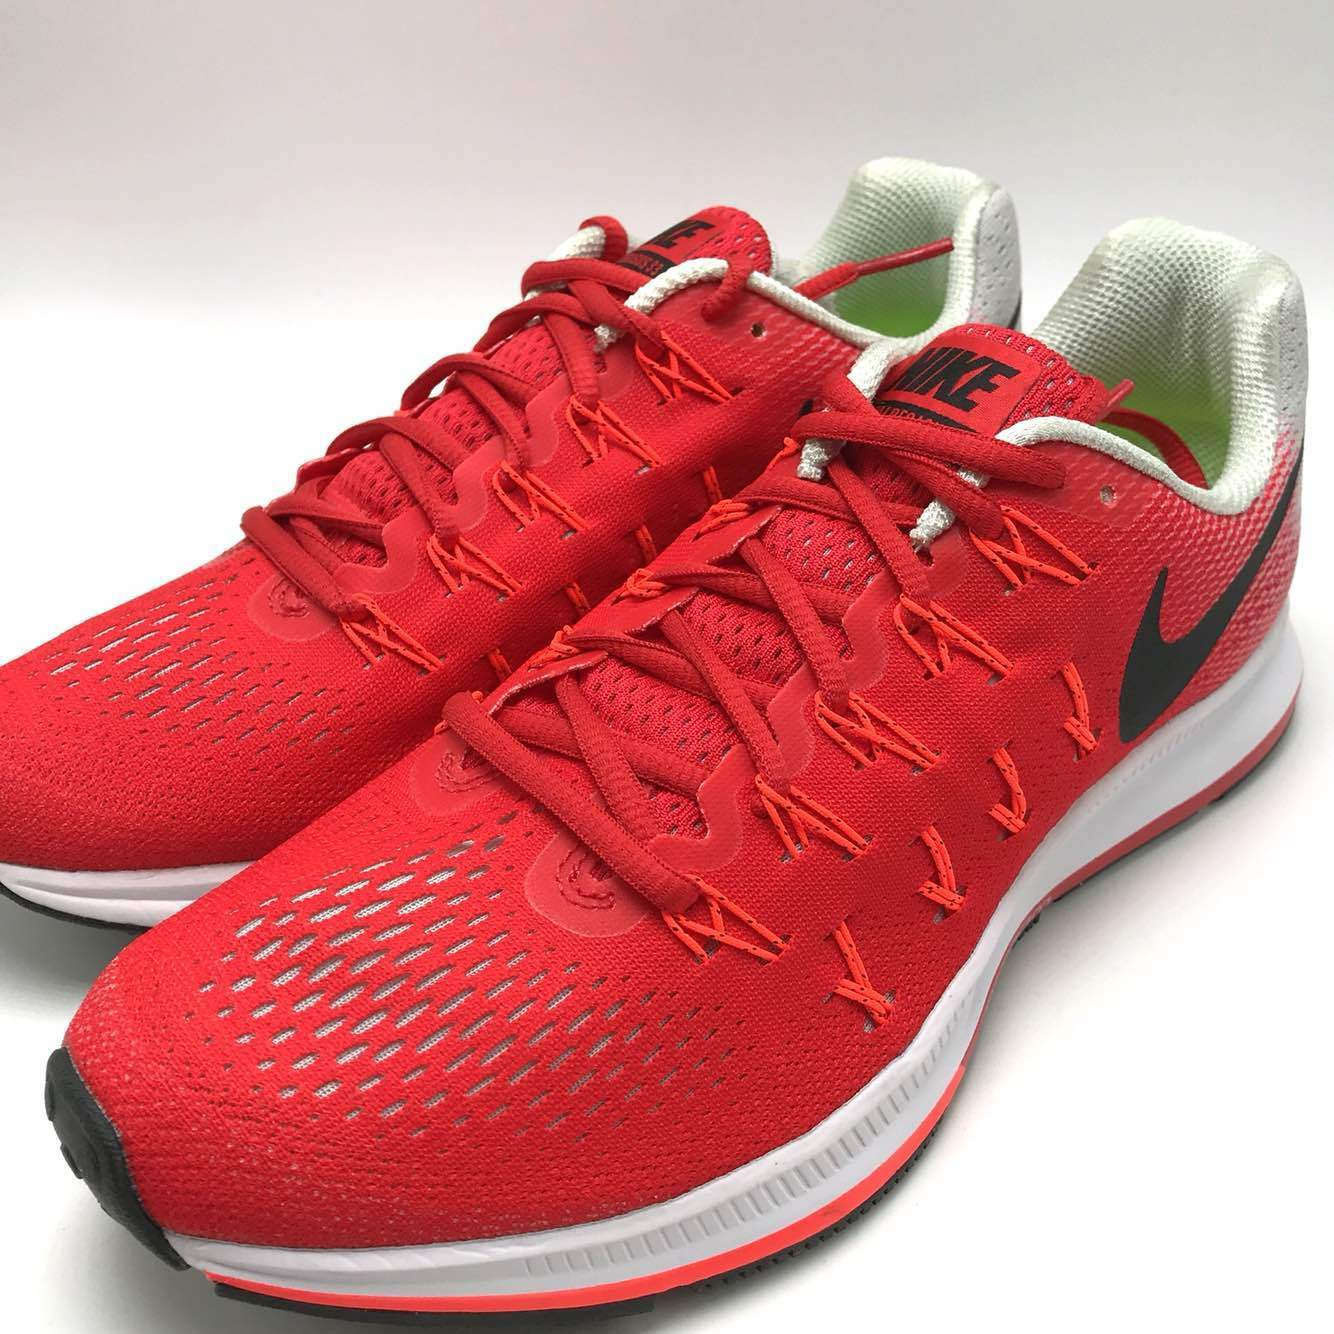 Nike Air Zoom Shoes Pegasus 33 Men's Running Shoes Zoom Red/Black-Crimson 831352-600 1ecb4c